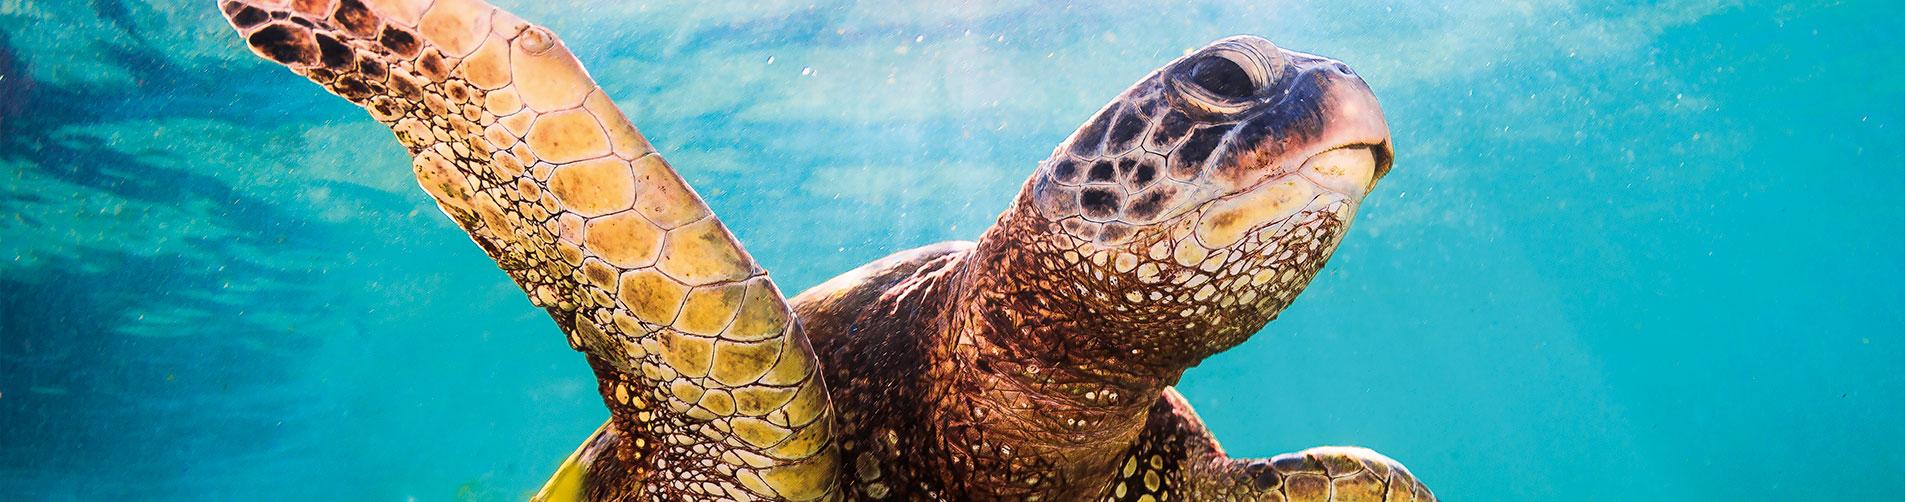 Scuba Diving Montego Bay - Slide